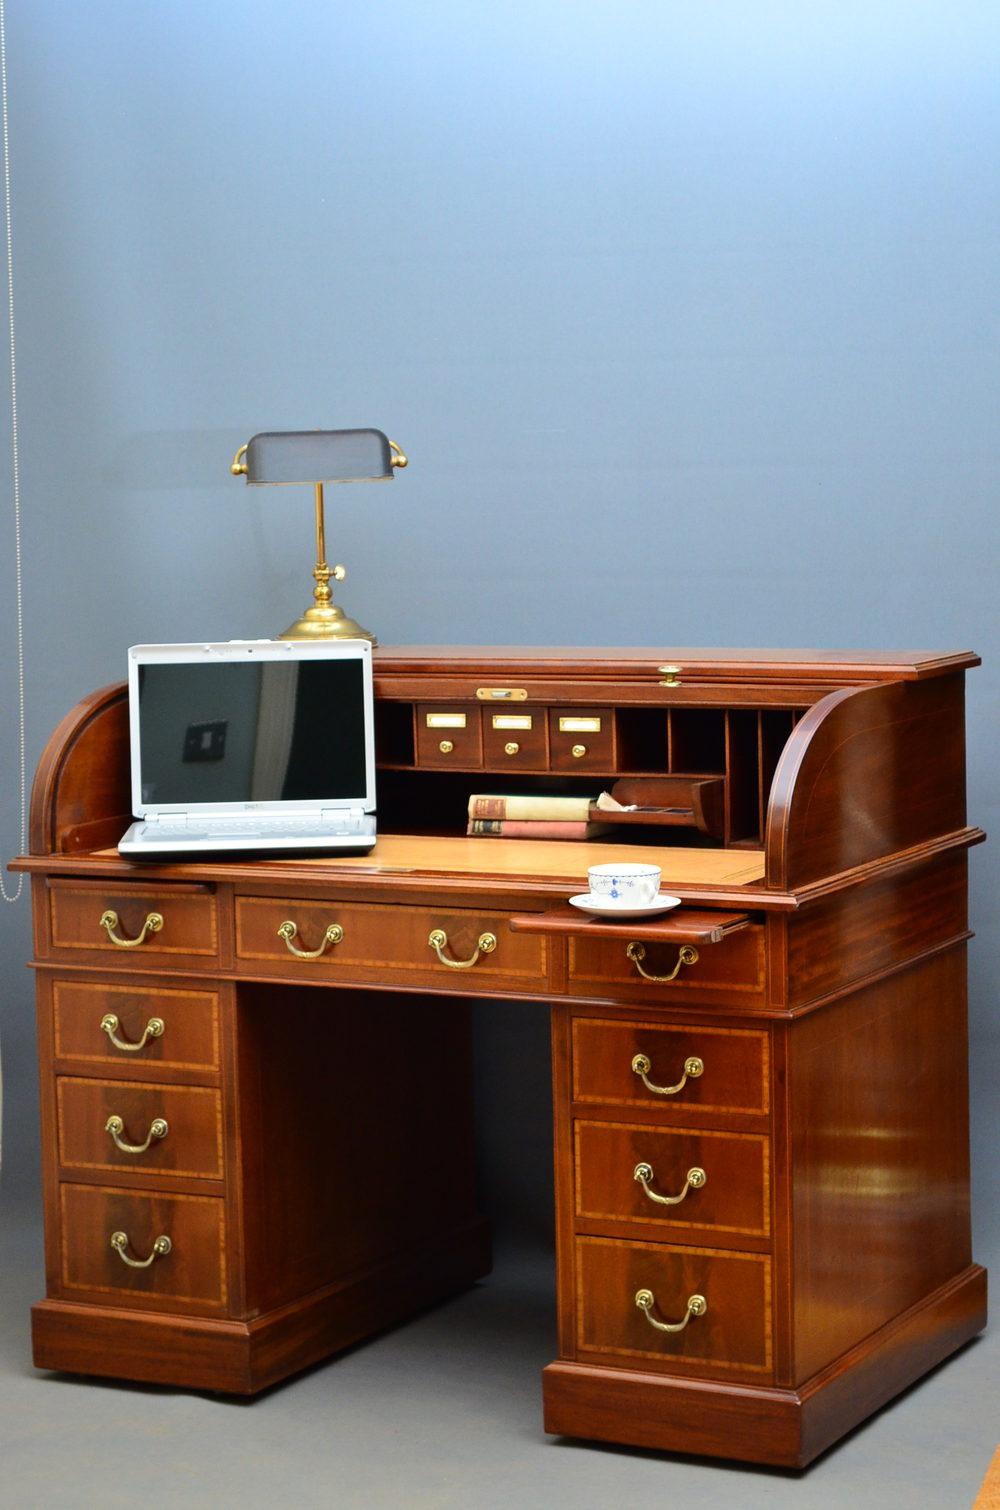 Edwardian Roll Top Desk By Maple Amp Co Antiques Atlas